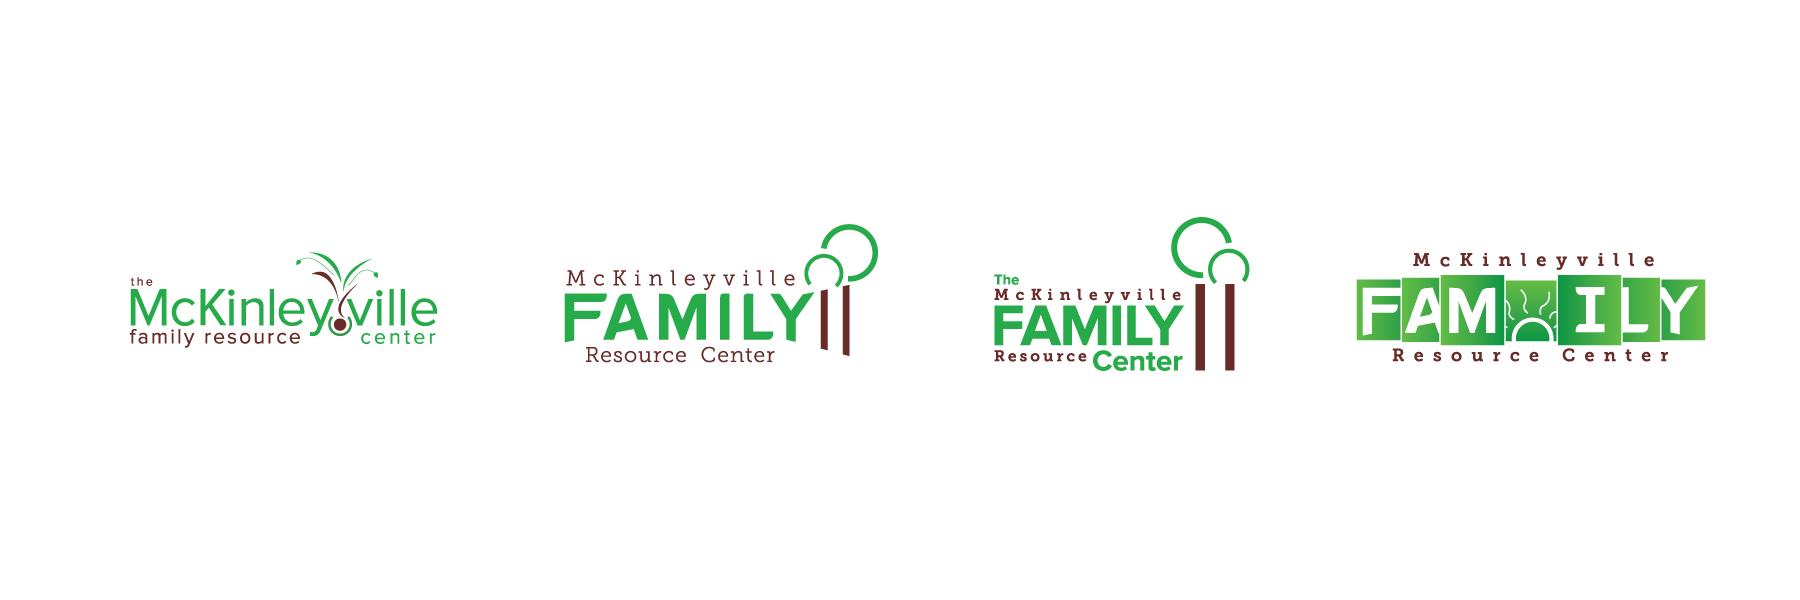 Logo drafts for McKinleyville Family Resource Center